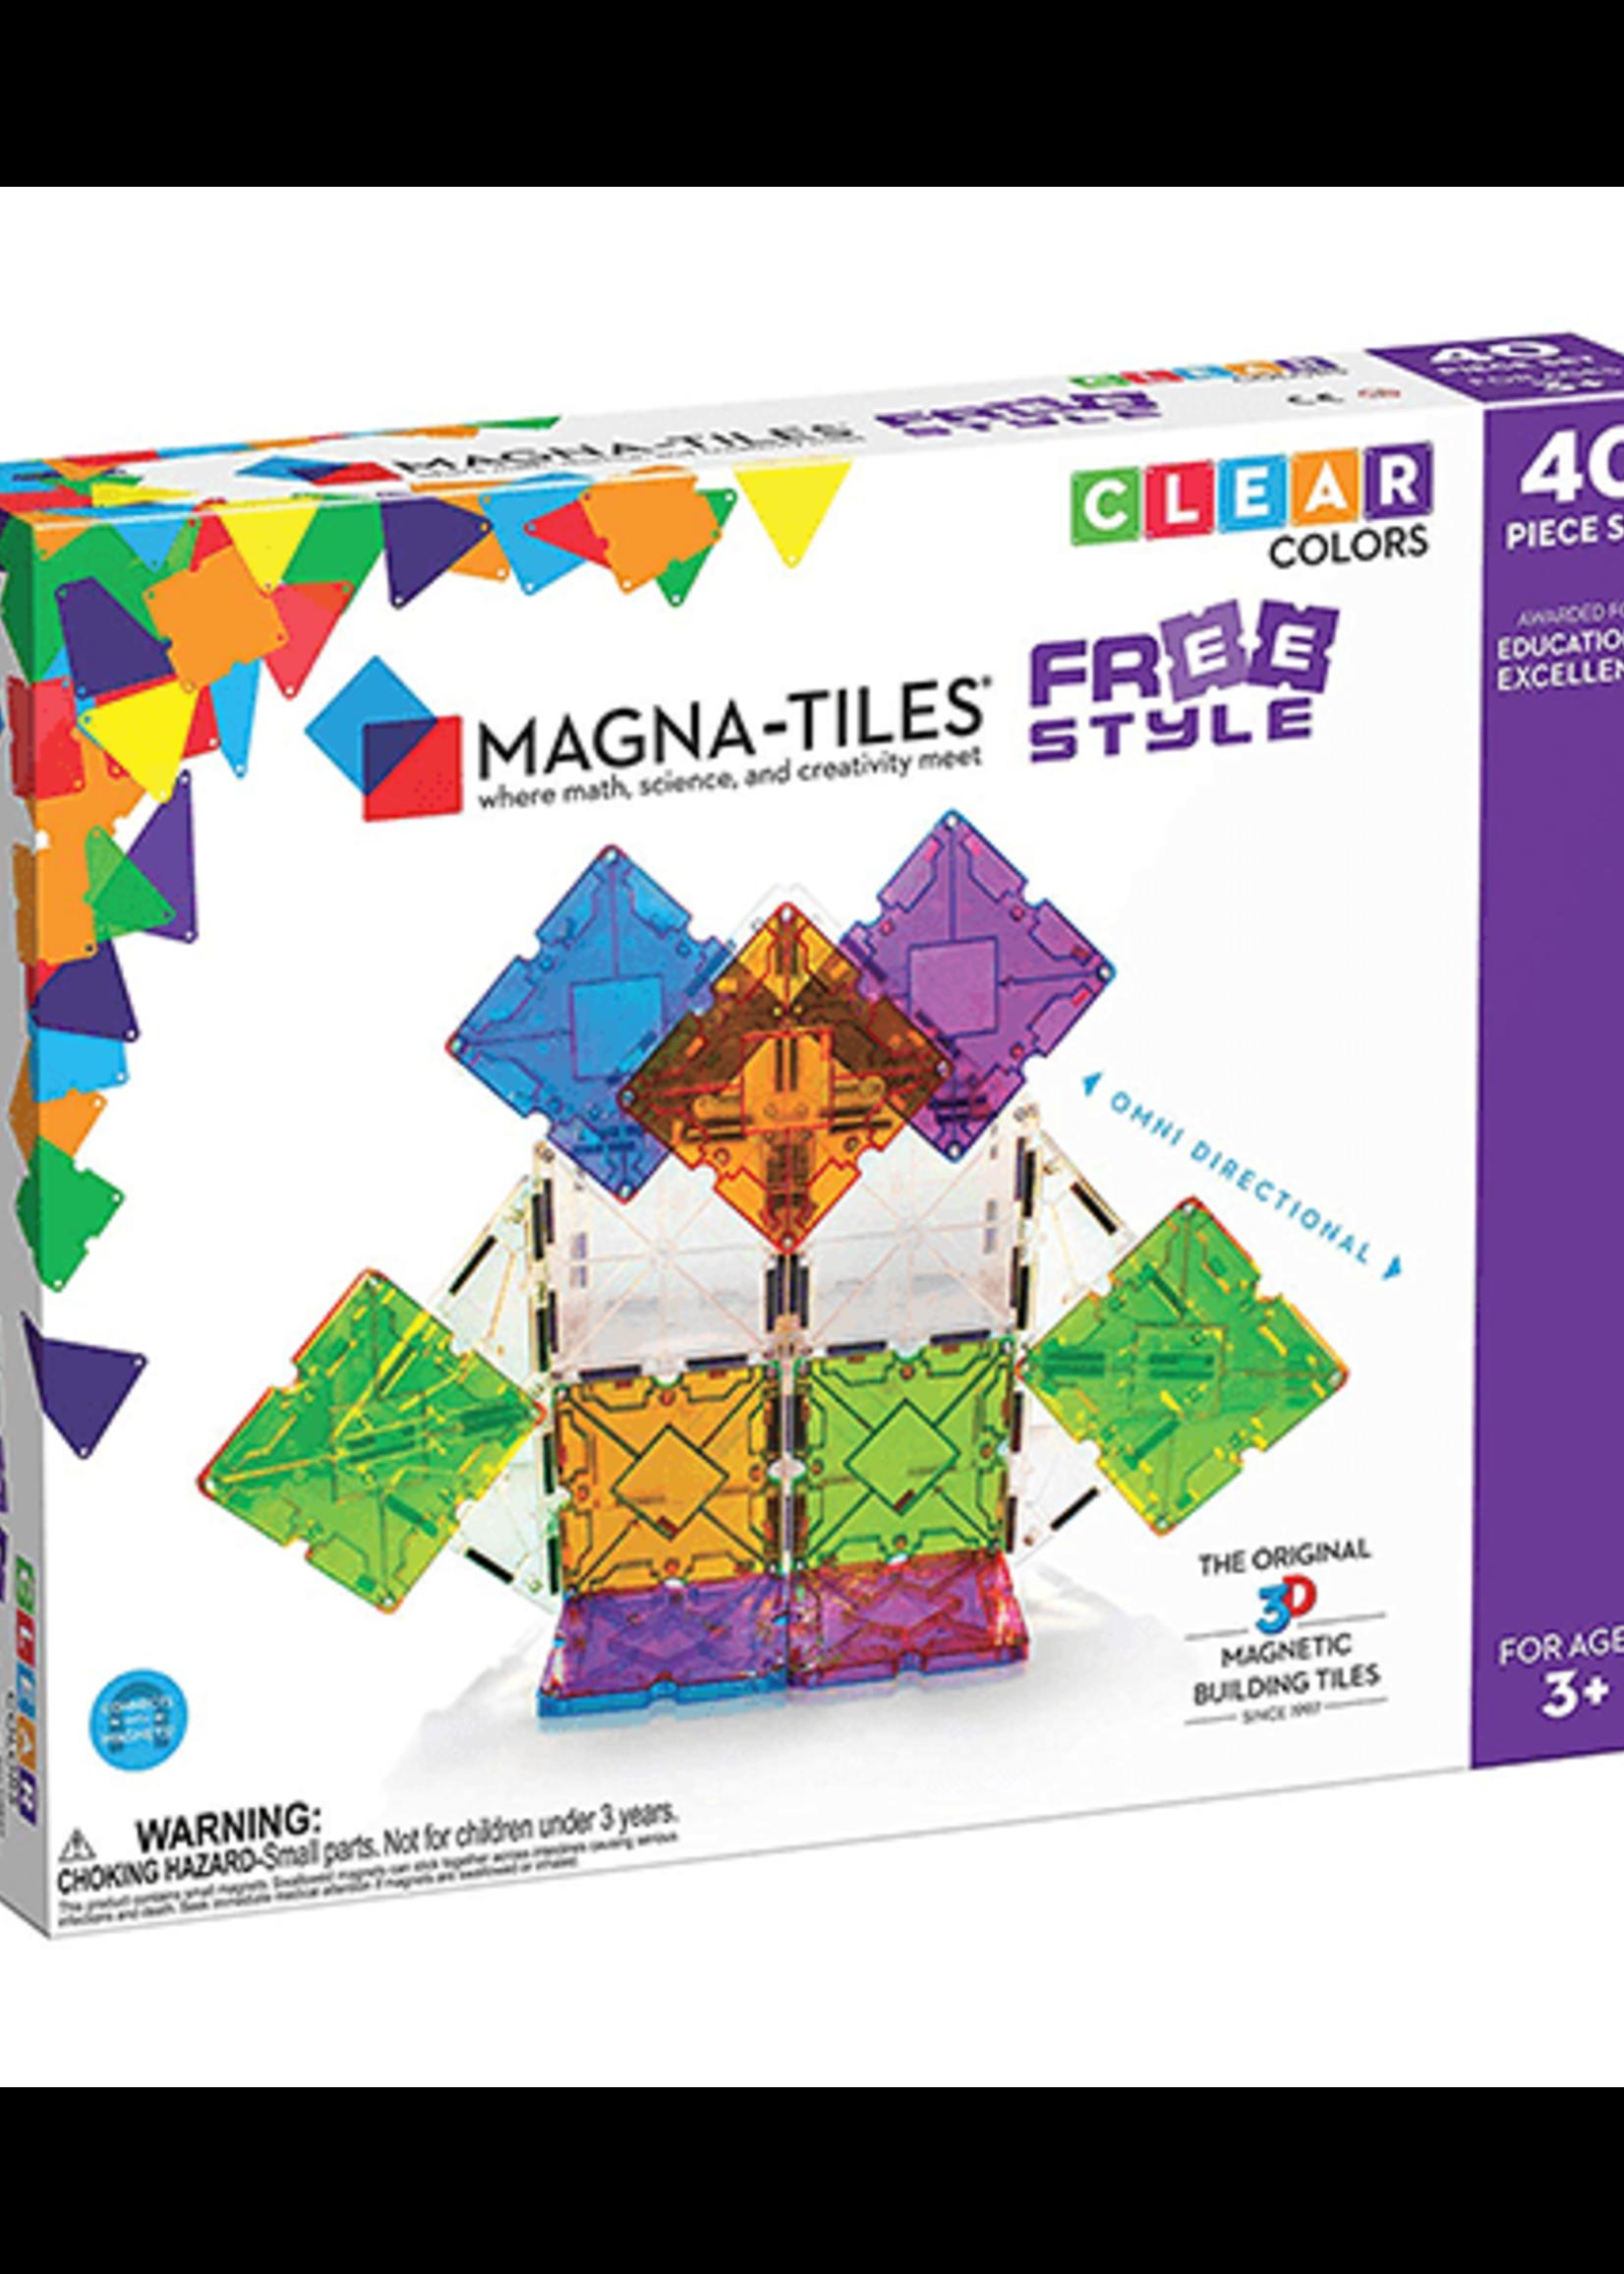 Magna Tiles Magnatile Free Style 40 piece